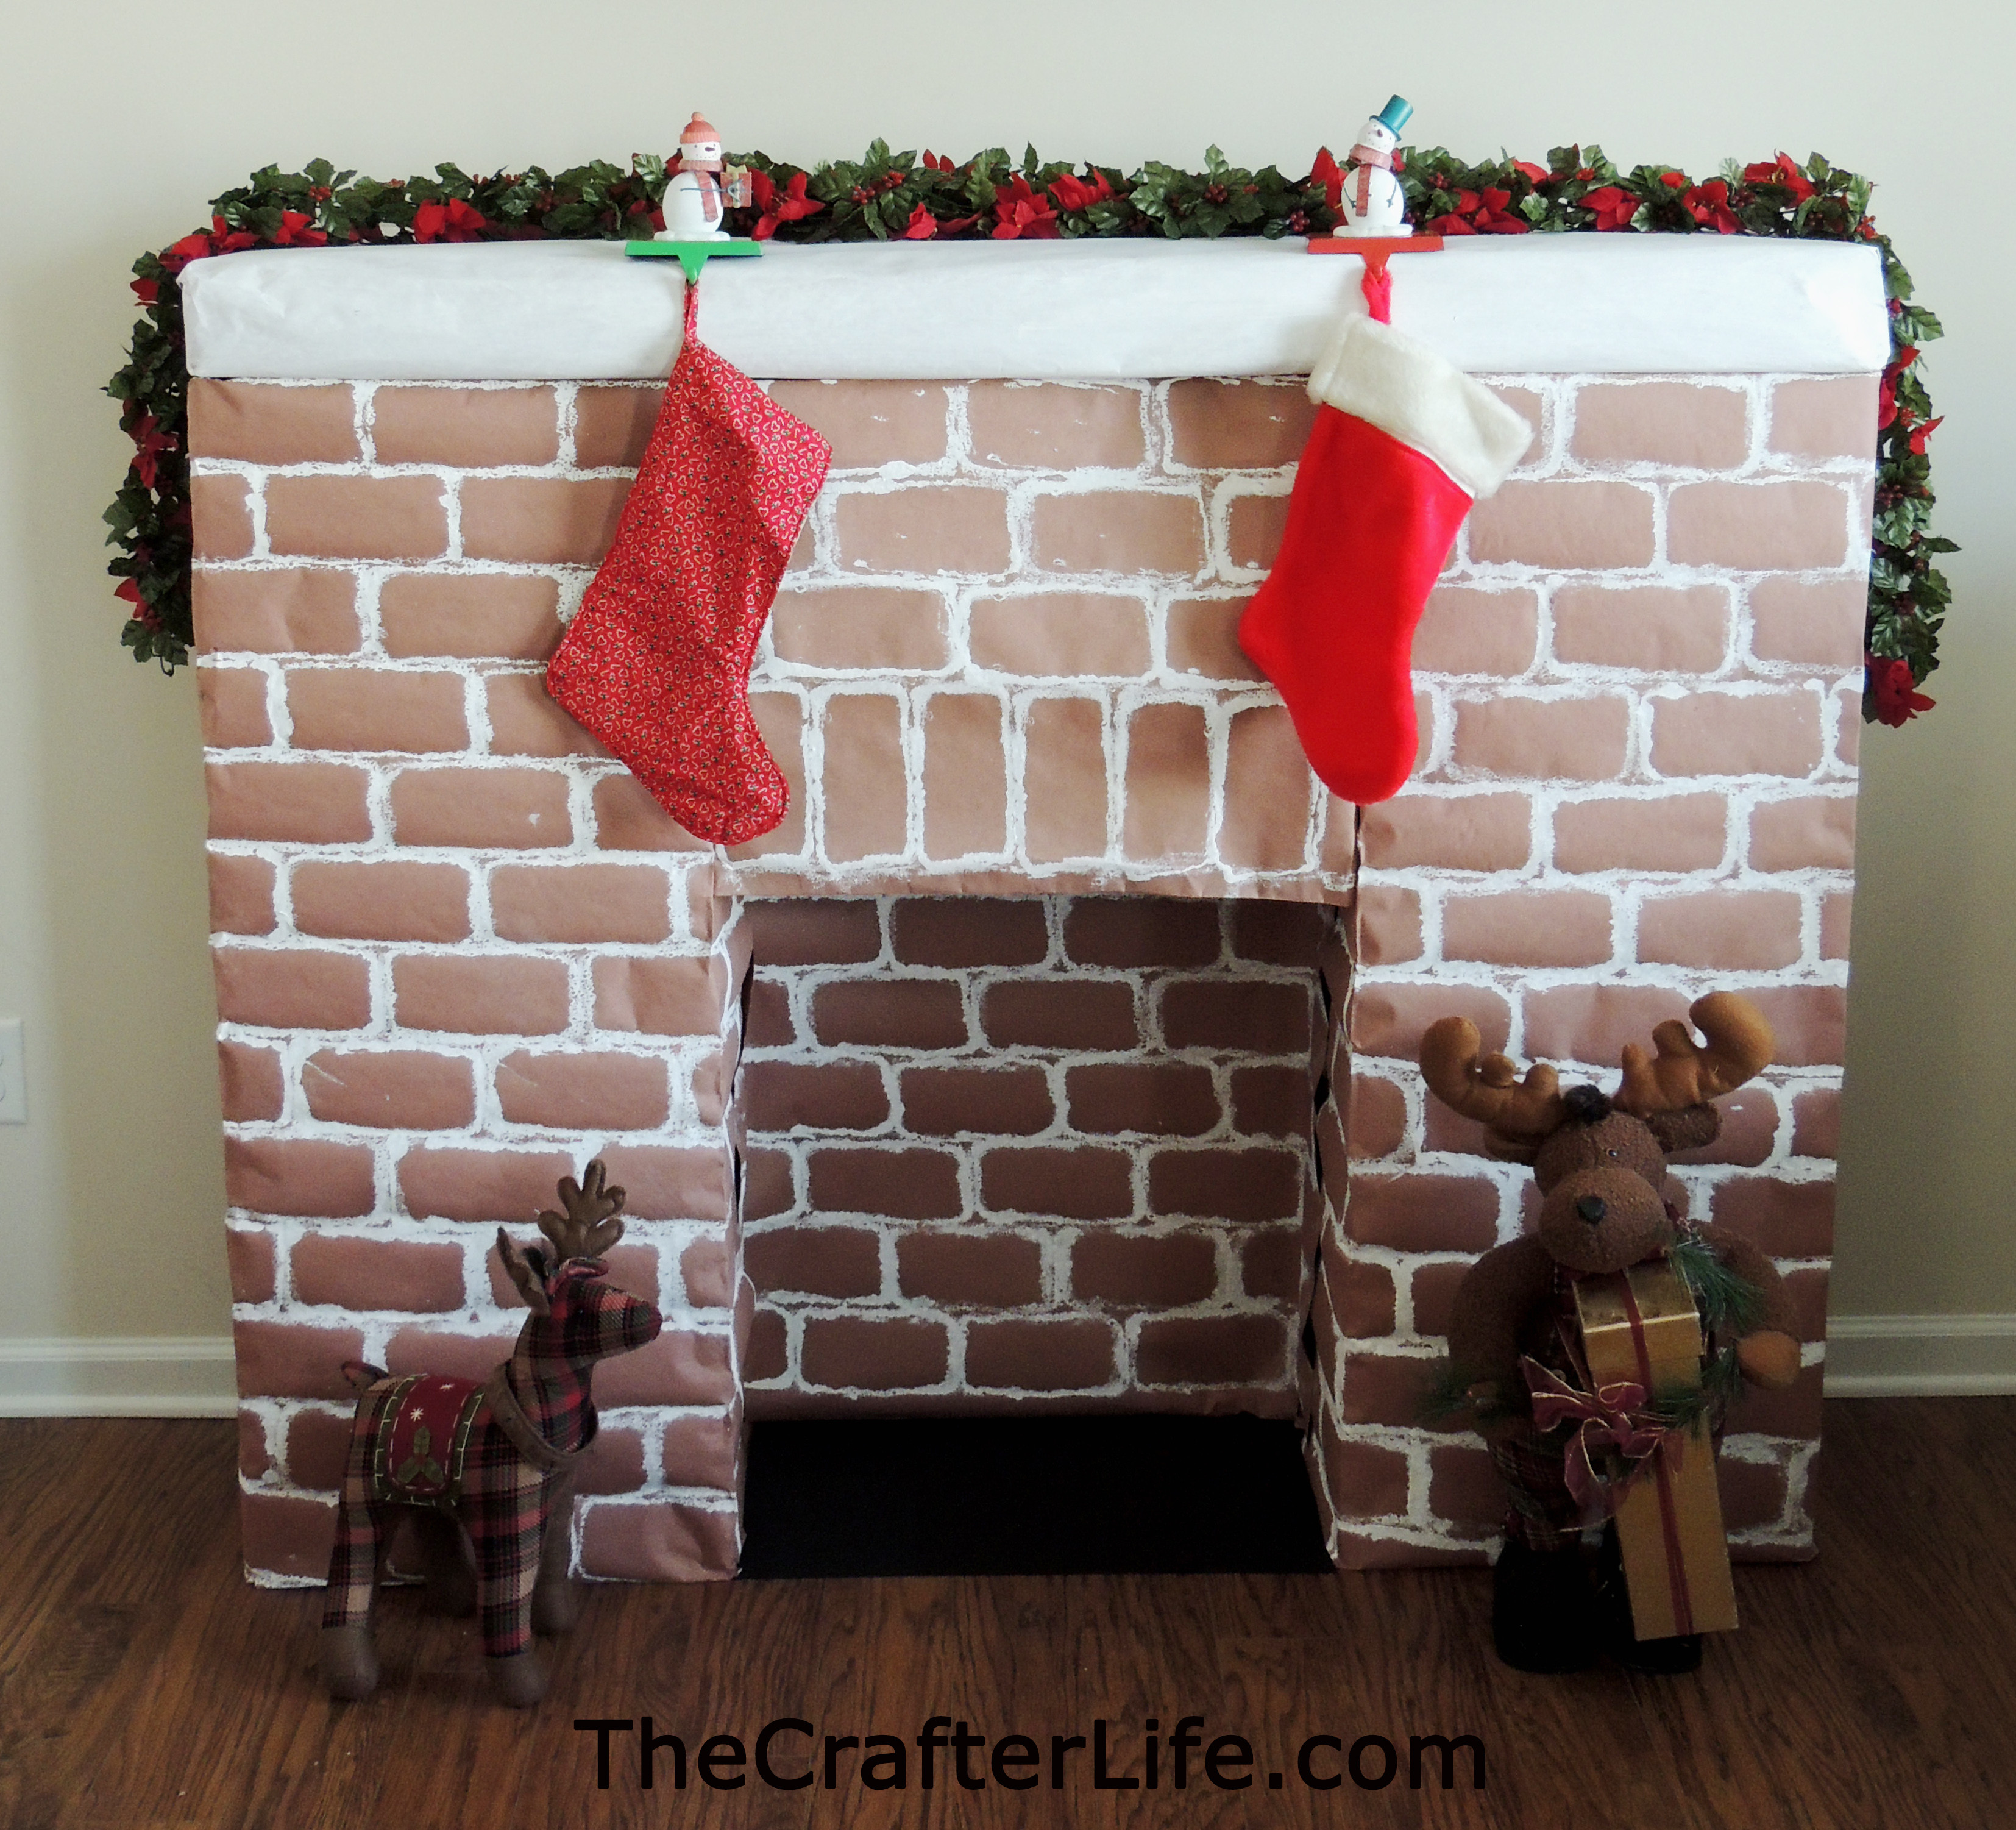 Christmas Cardboard Fireplace  Cardboard Fireplace The Crafter Life